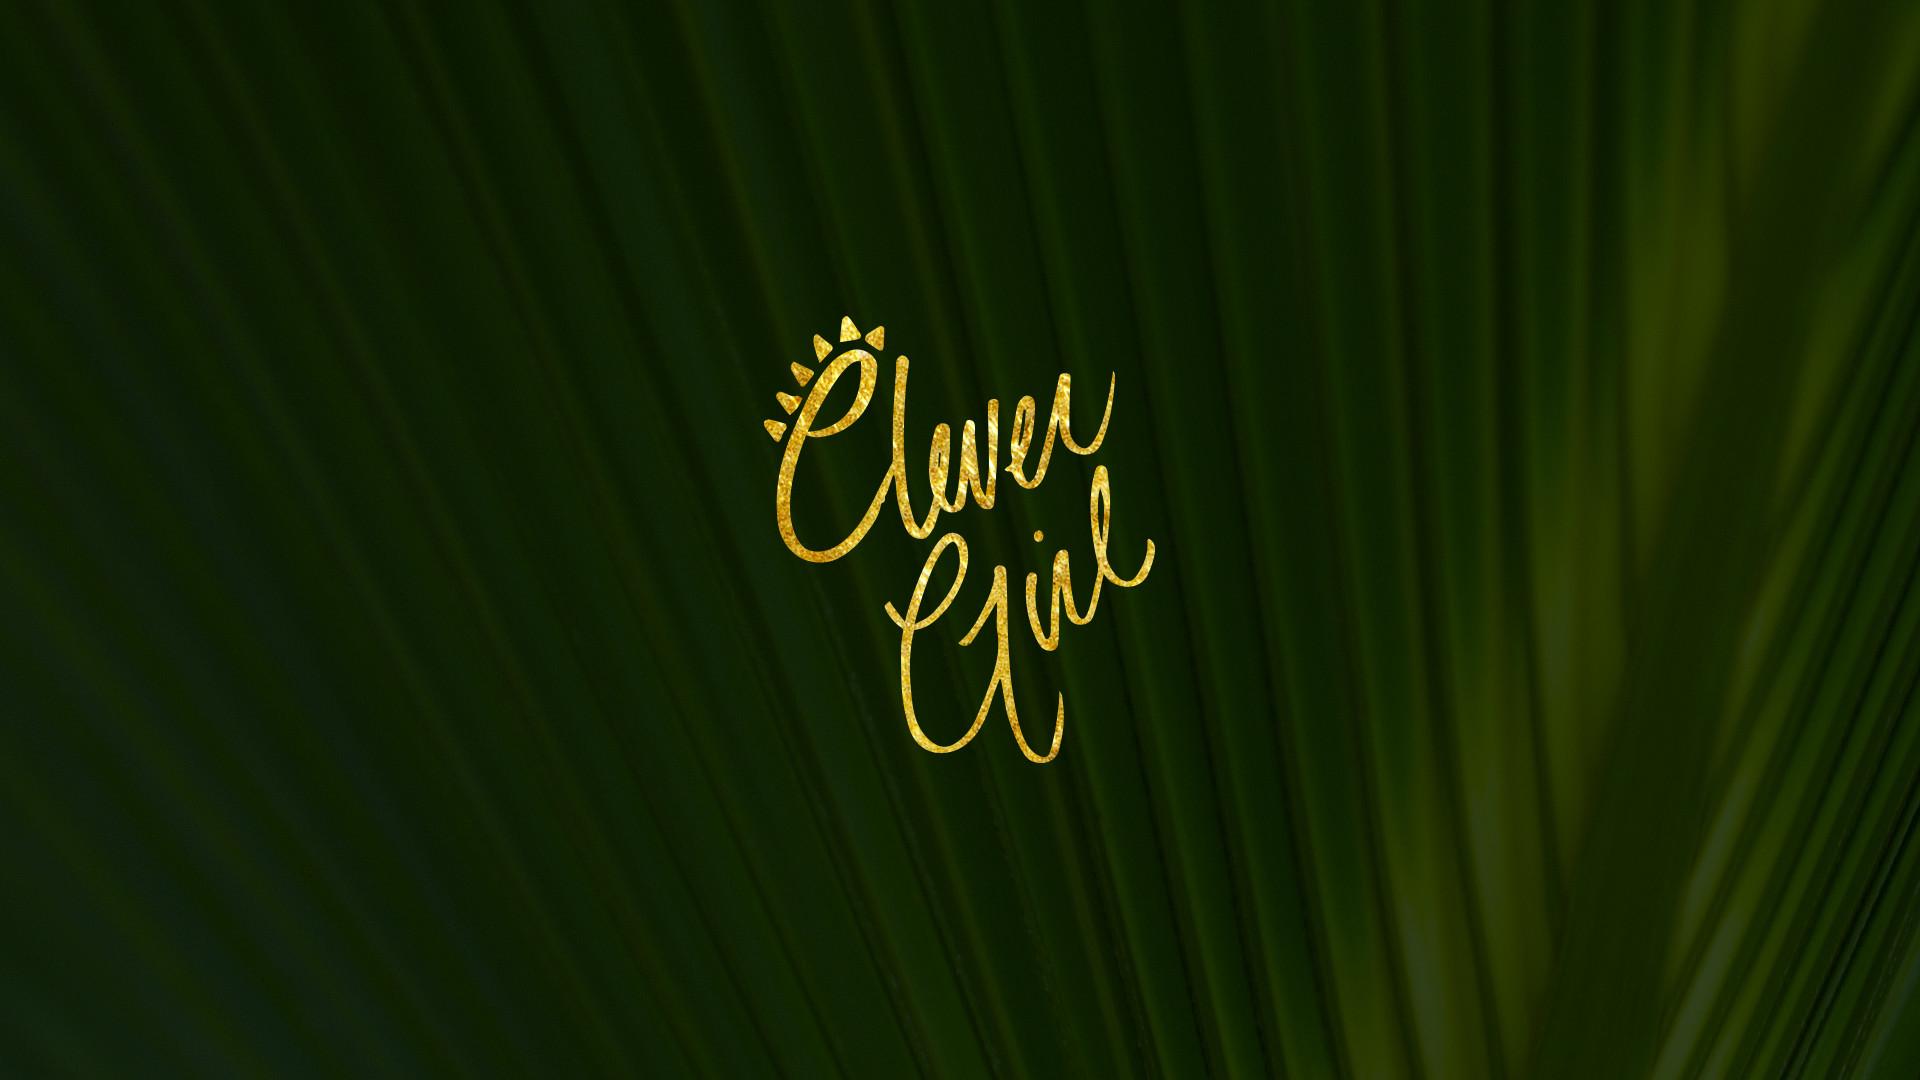 Free Wallpaper: Clever Girl – E-Rad's Cantina